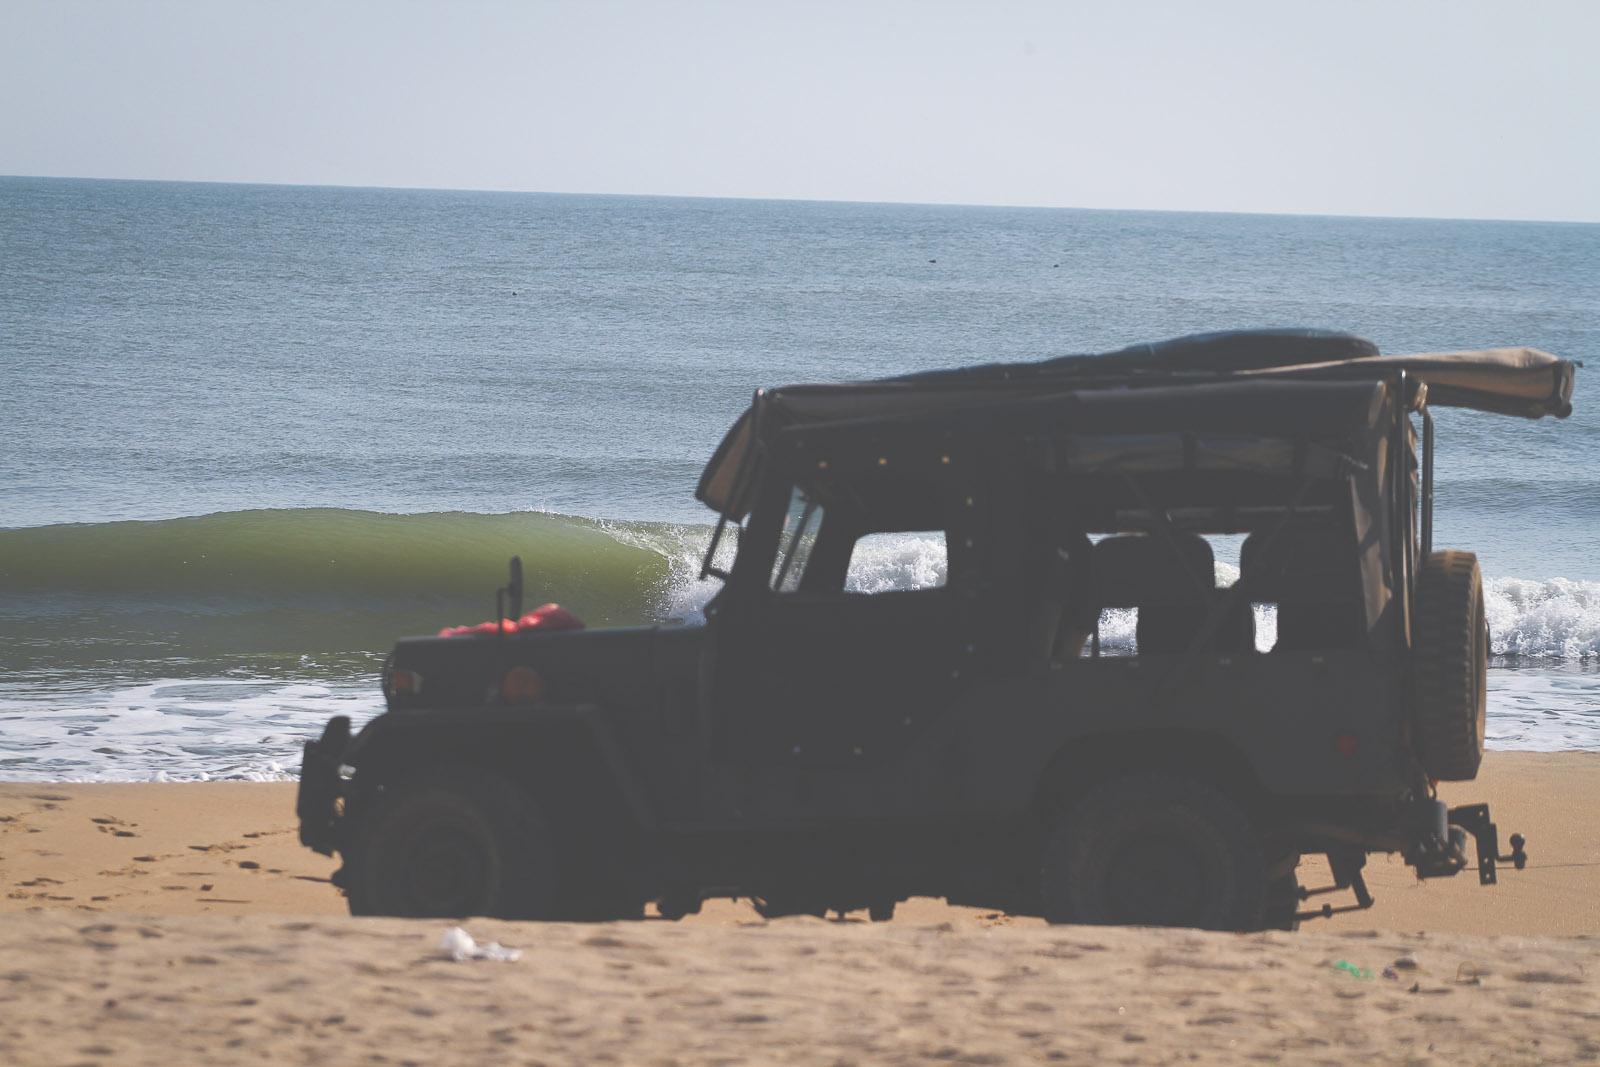 Sri Lanka-Hikkaduwa-Midigama-Aragum Bay-Sunshinestories-surf-travel-blog-IMG_9381